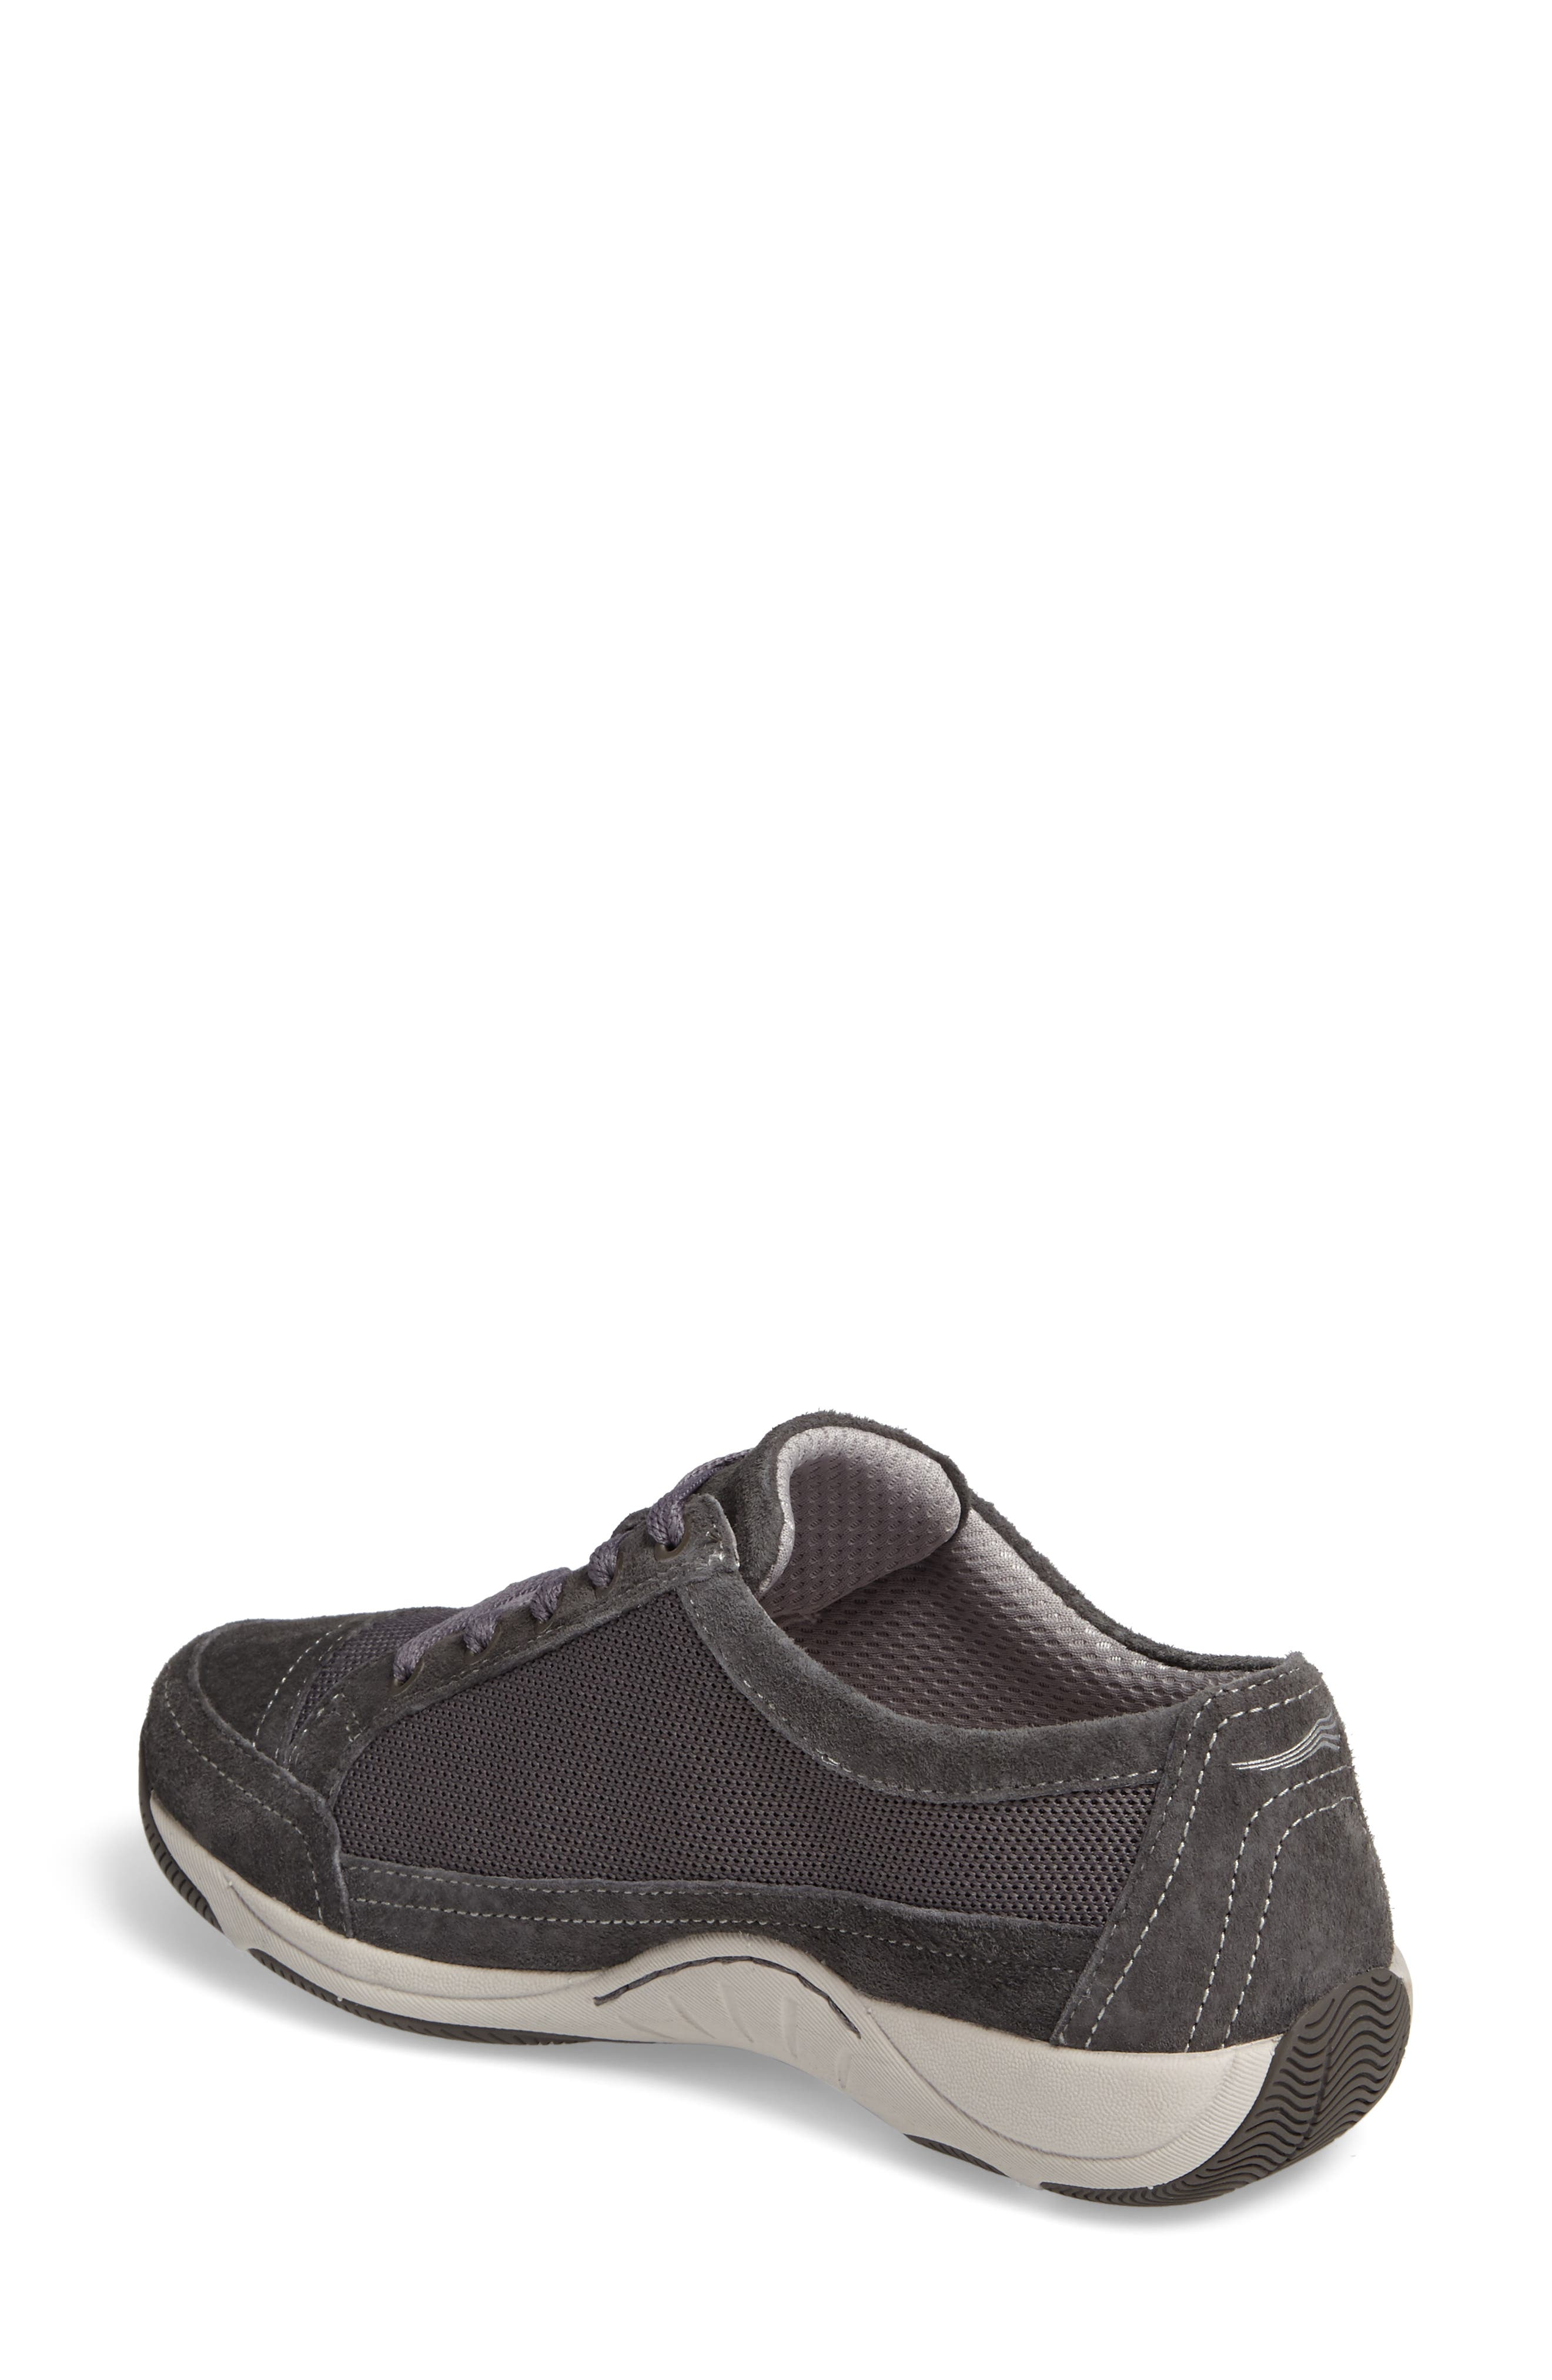 Harmony Sneaker,                             Alternate thumbnail 5, color,